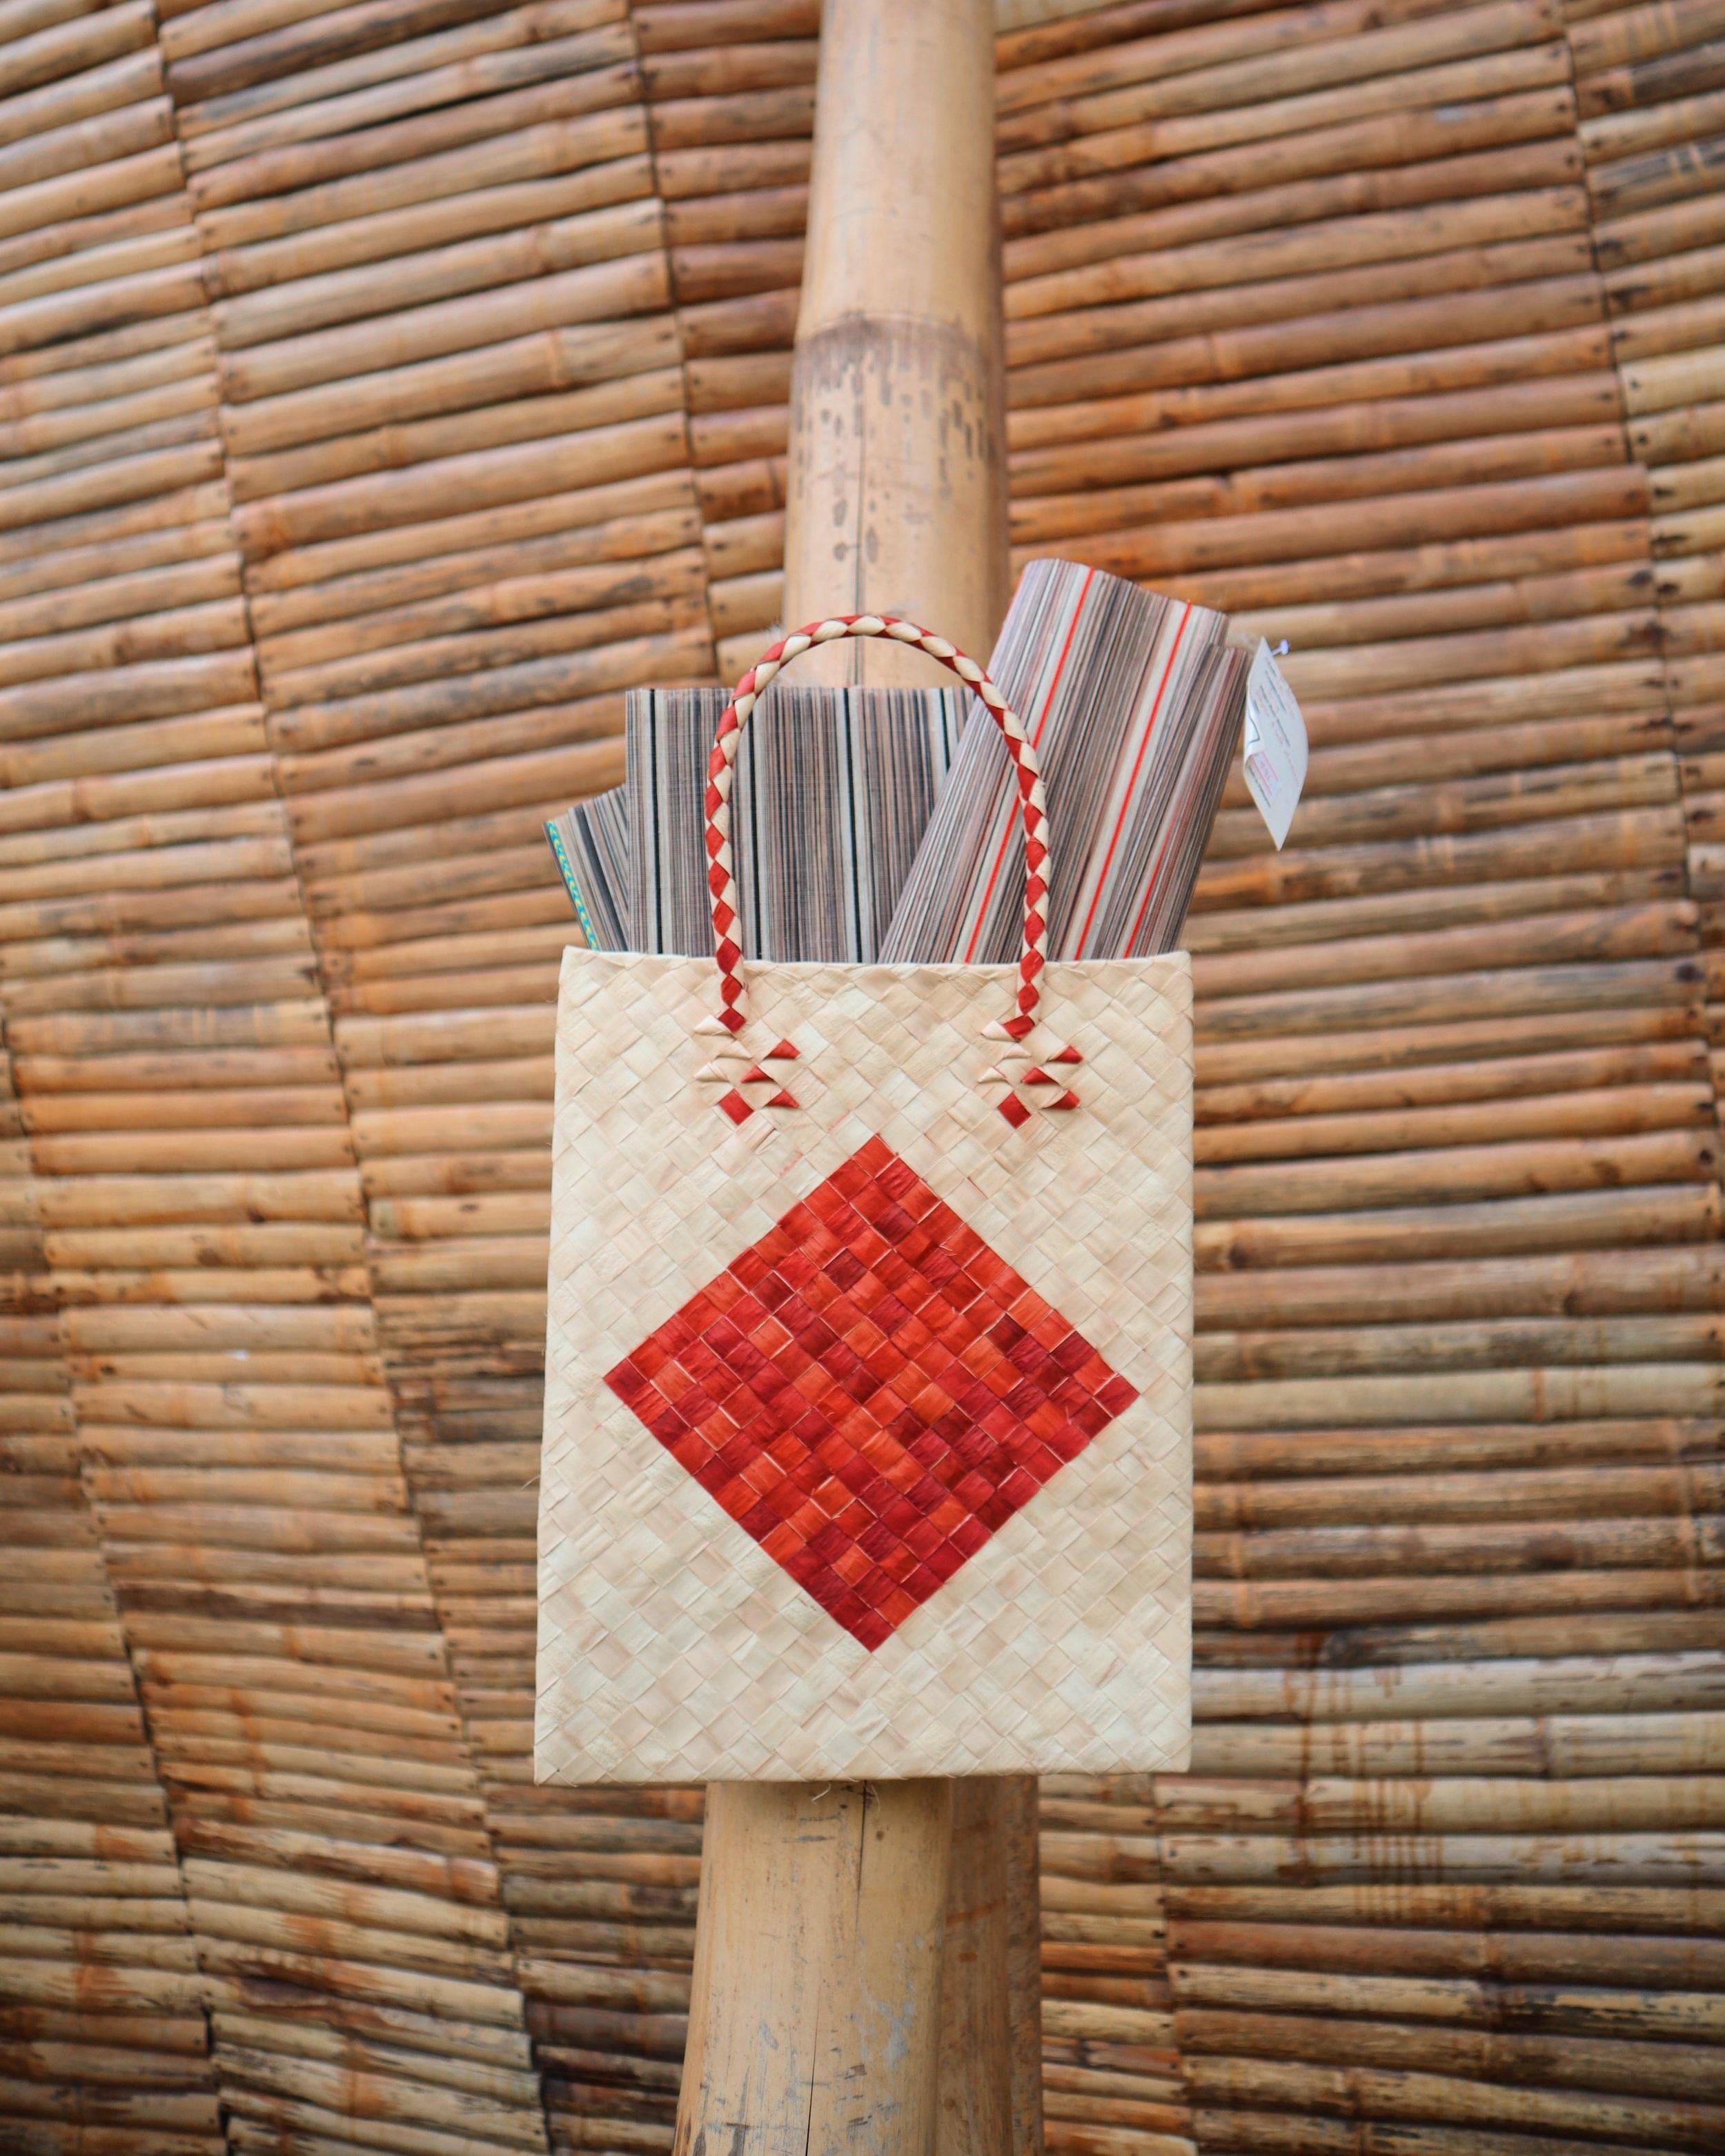 Buri Handcrafts